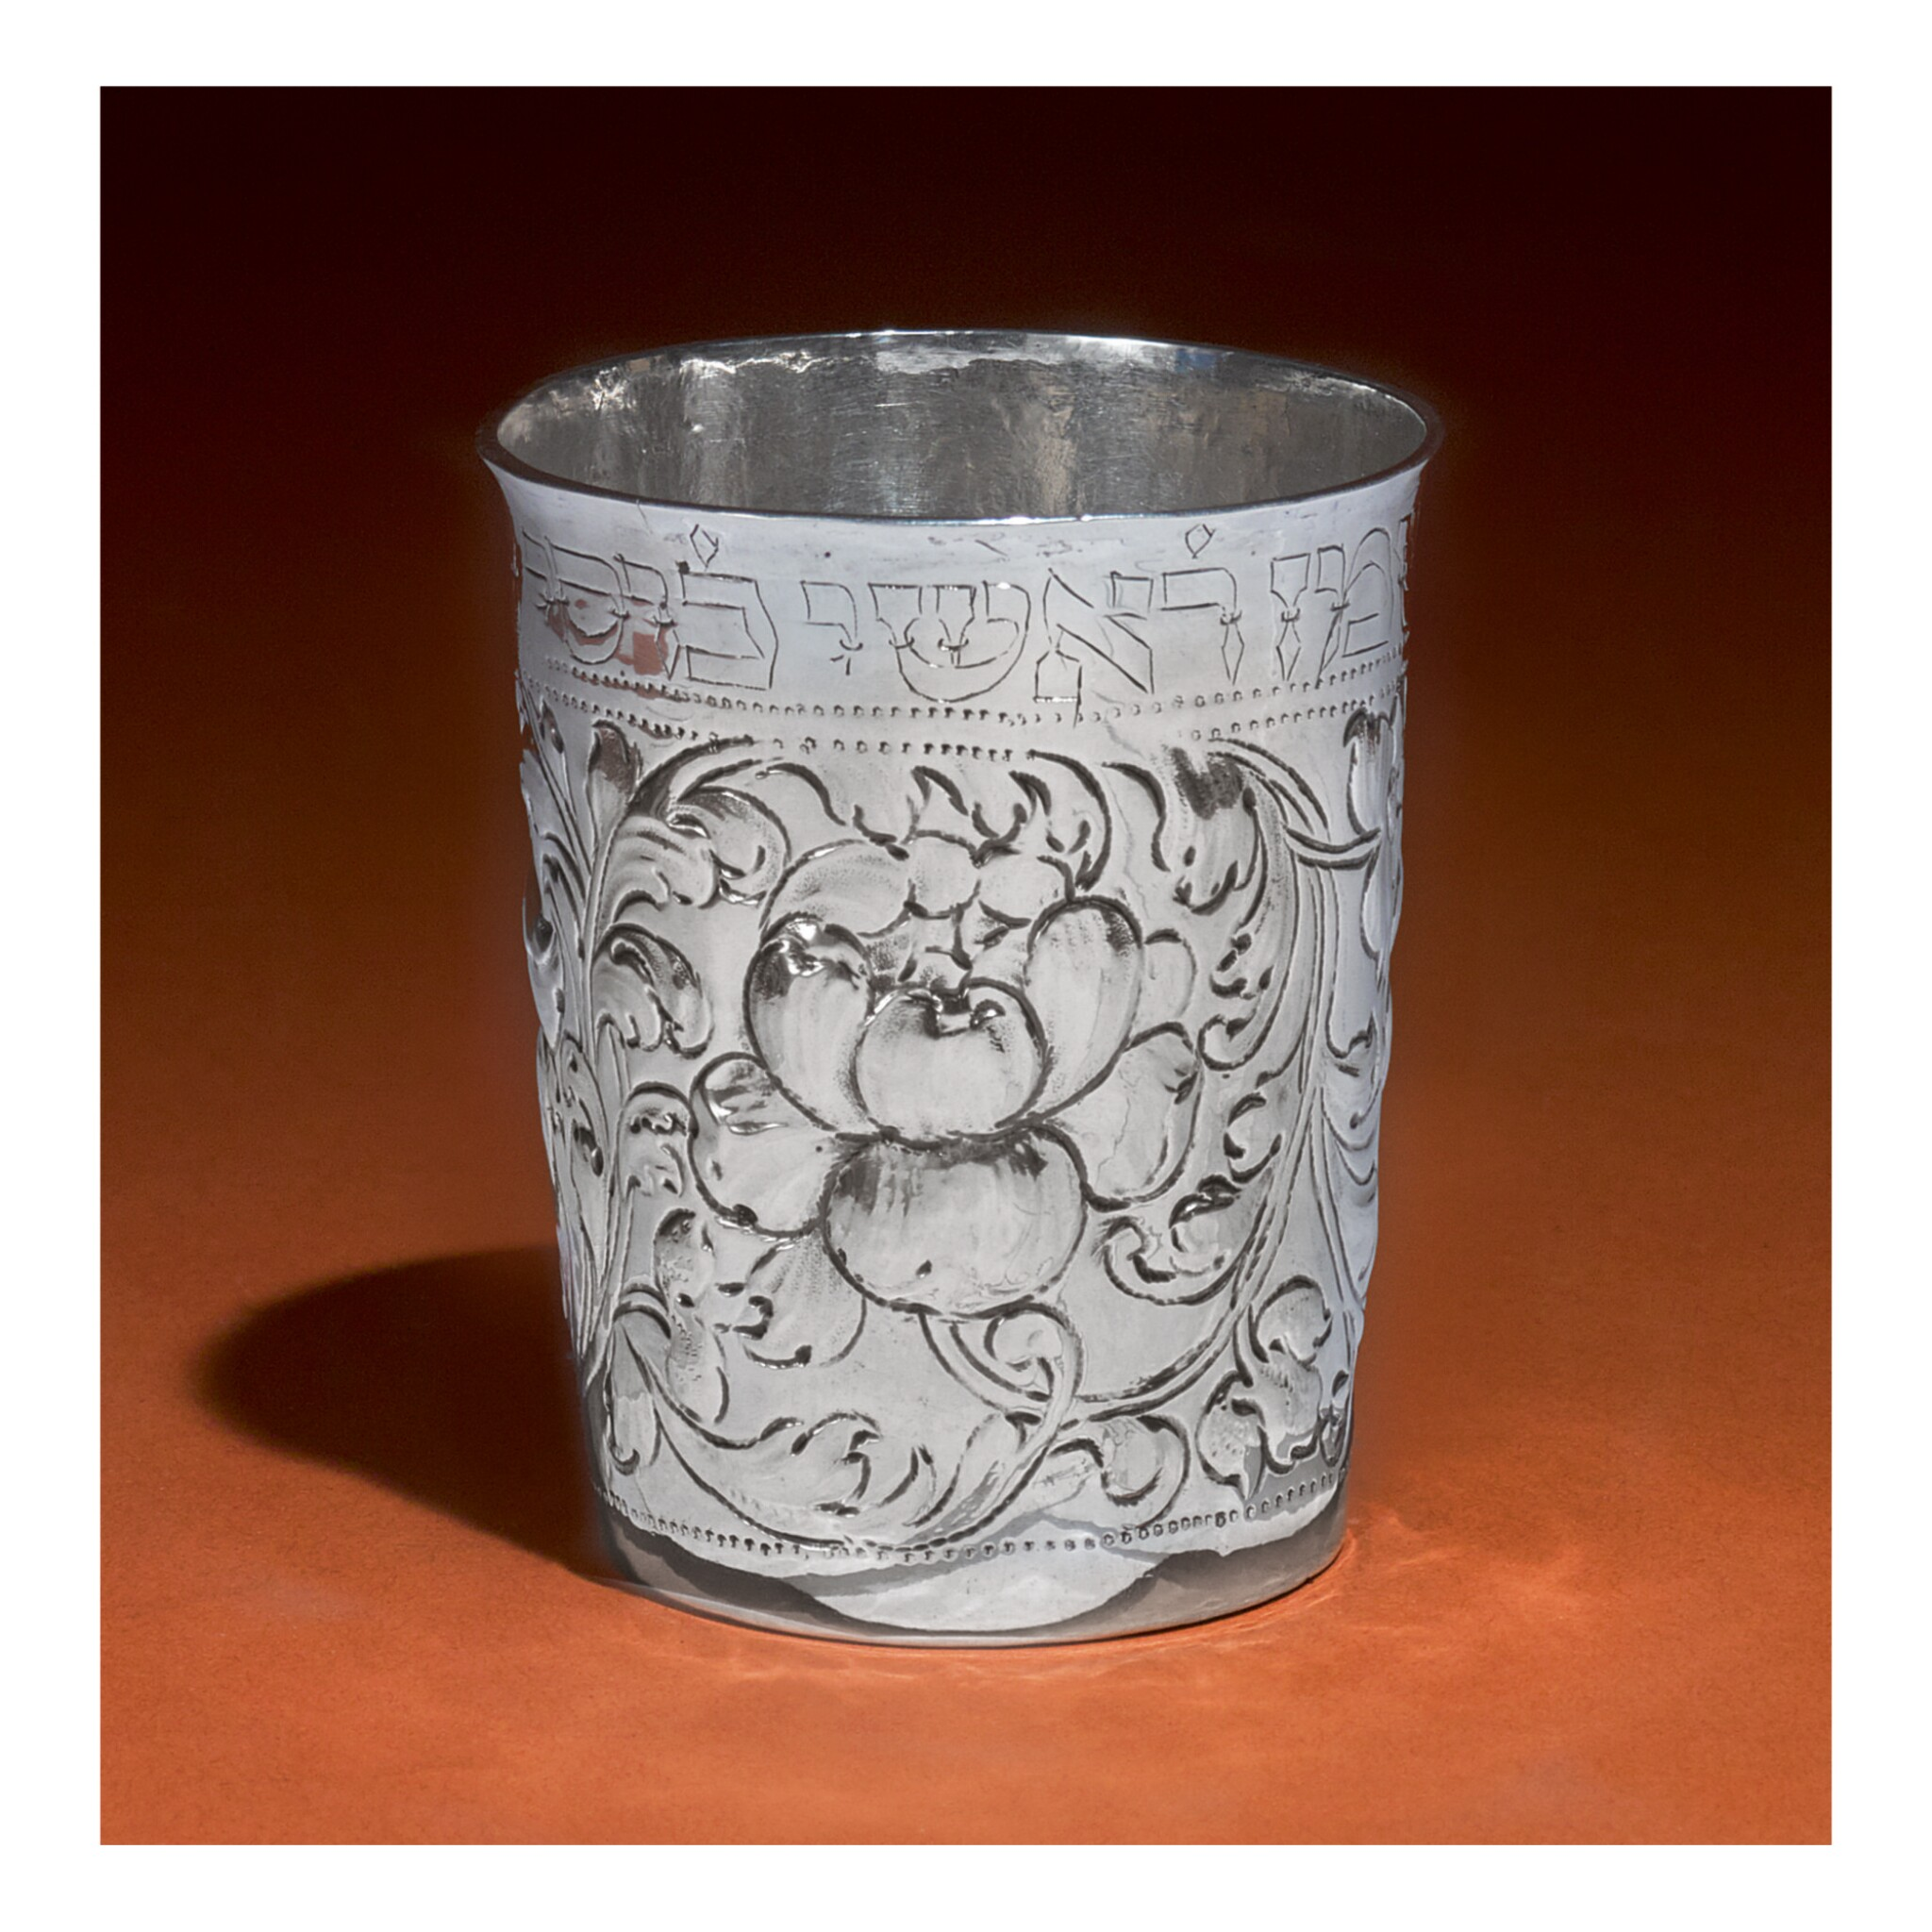 View 1 of Lot 119. A GERMAN SILVER KIDDUSH CUP, CASPAR BIRCKENHOLTZ, FRANKFURT, CIRCA 1660-70.